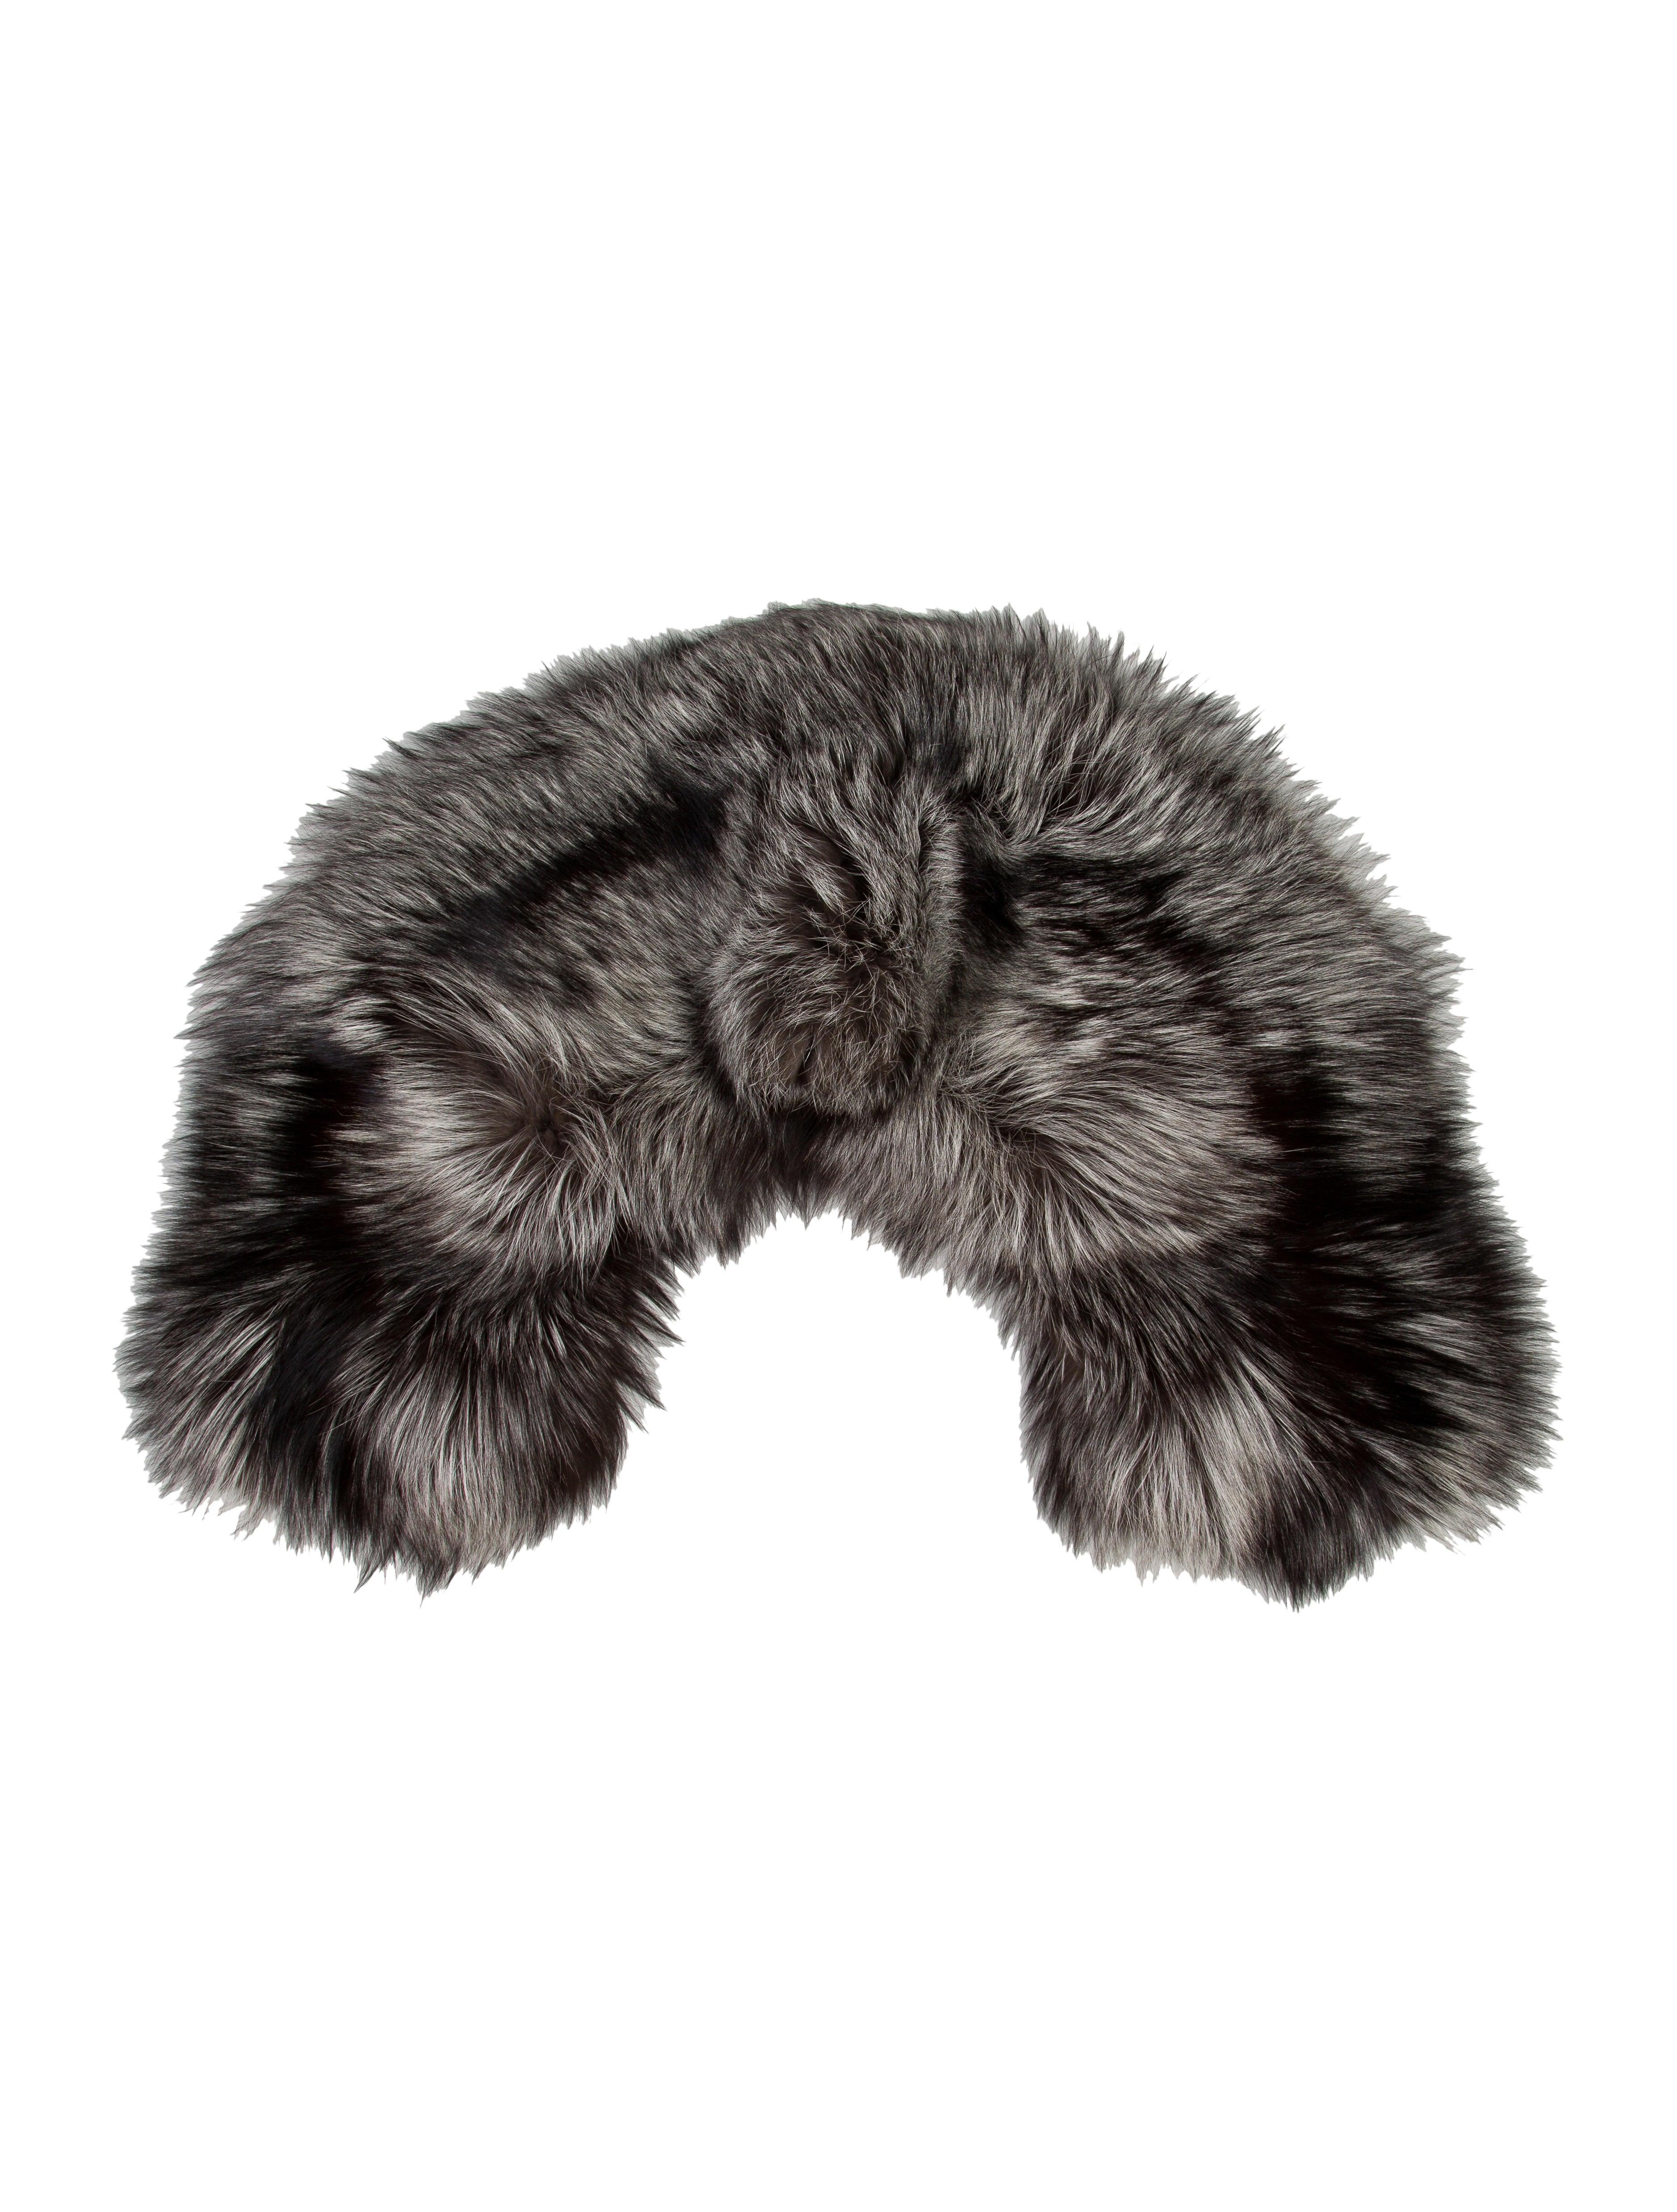 Alexander mcqueen fox fur stole accessories ale34371 the realreal - Stoel fur ...